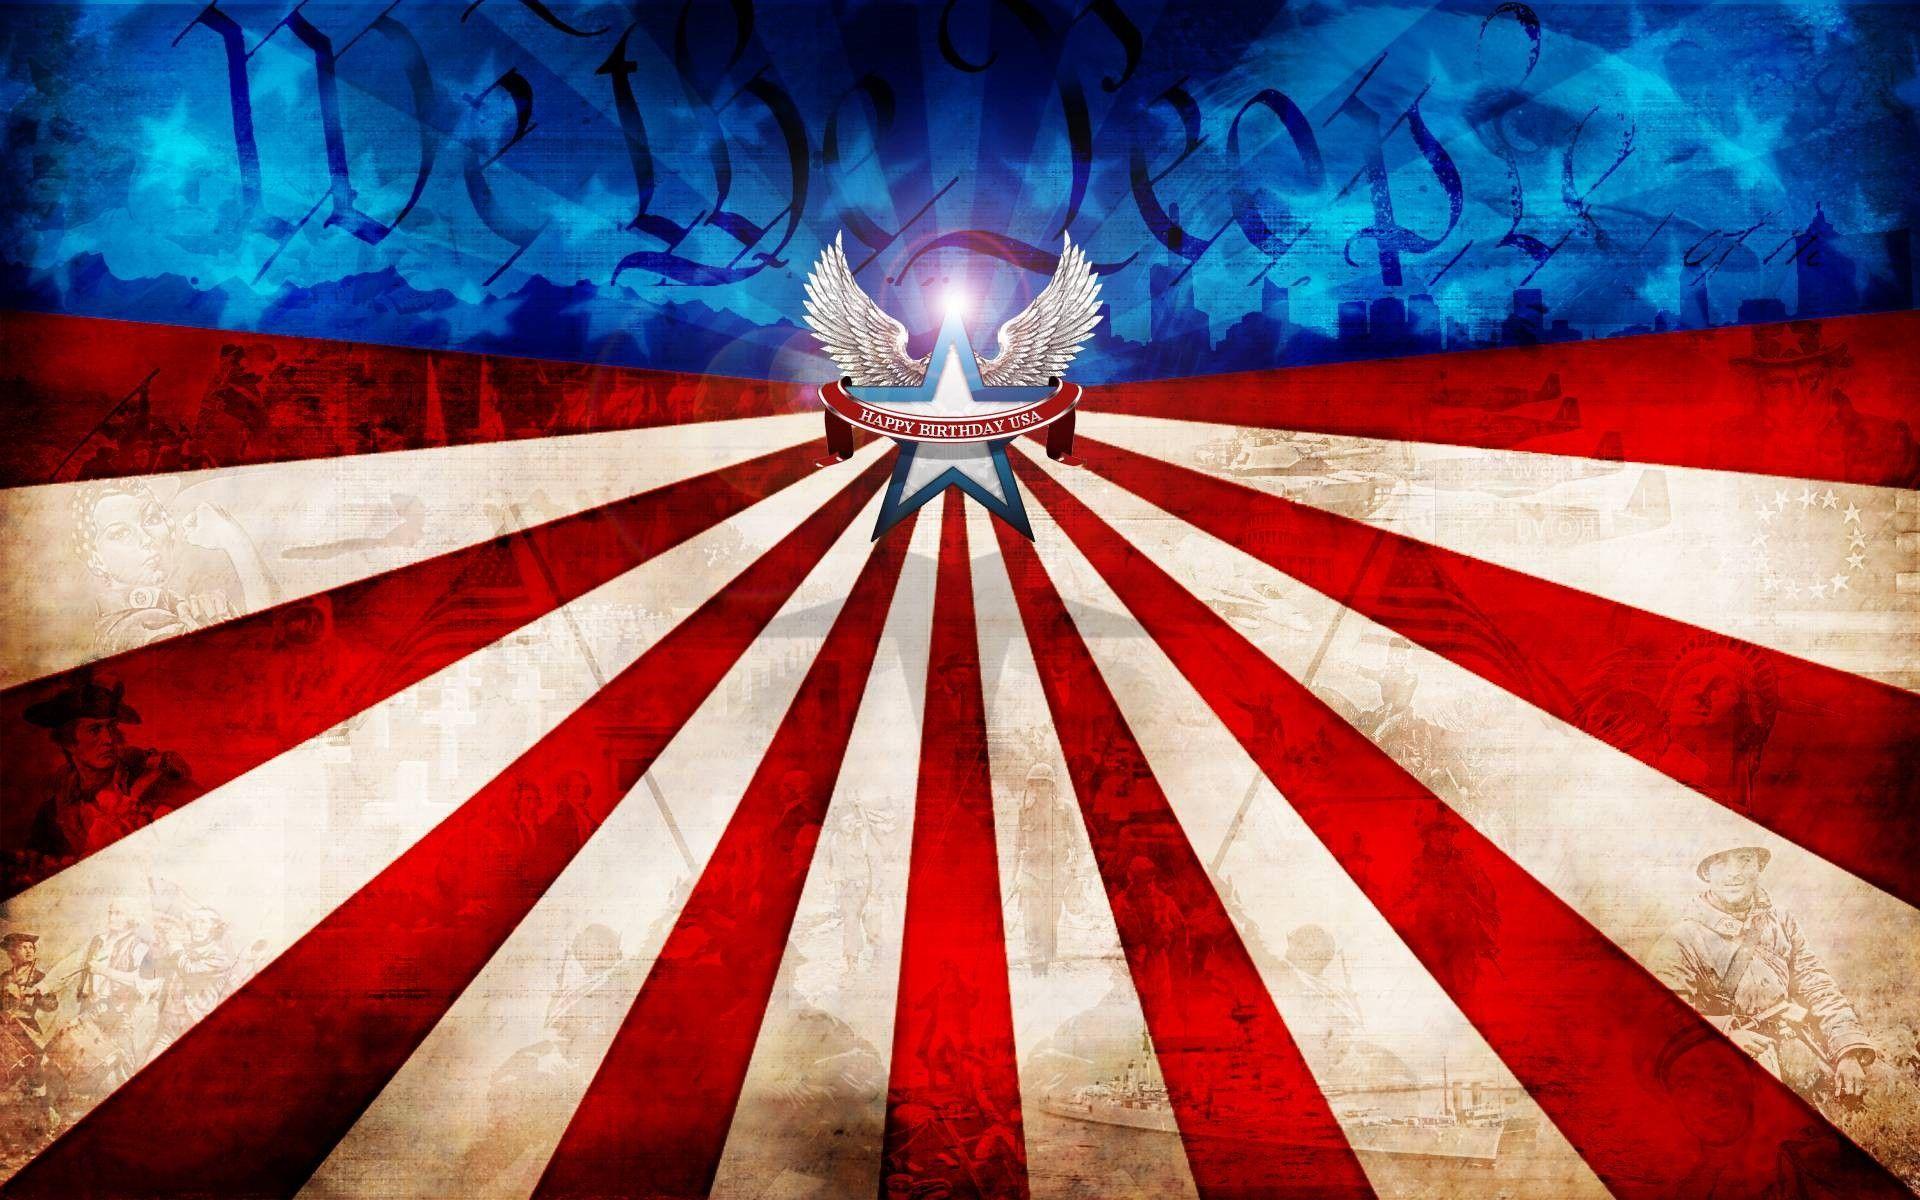 Patriotic Wallpaper Images